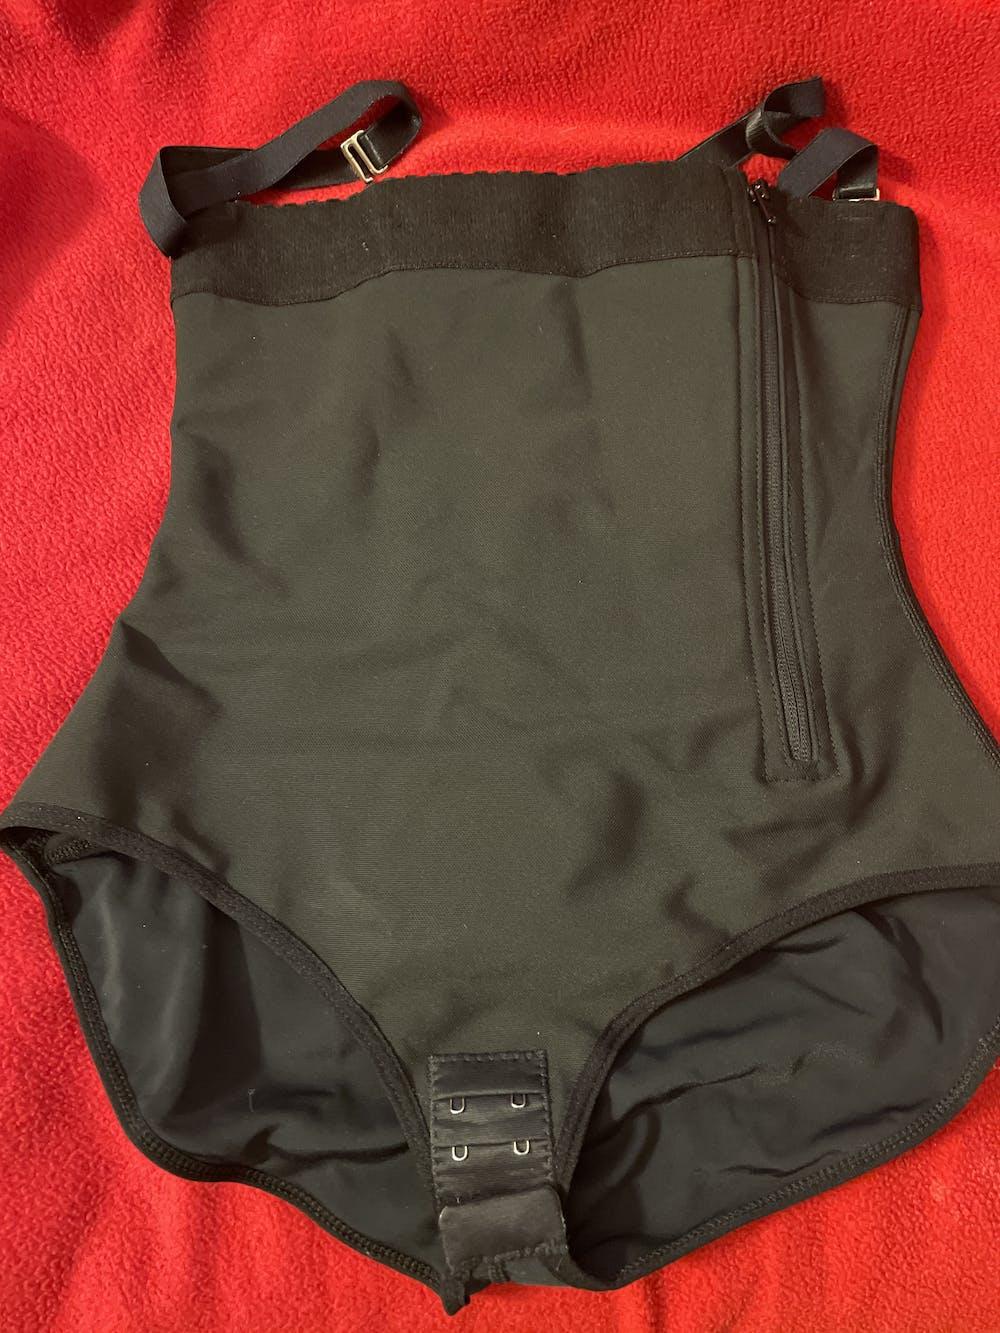 Powernet Strapless Zipper Faja Bodysuit - Panty